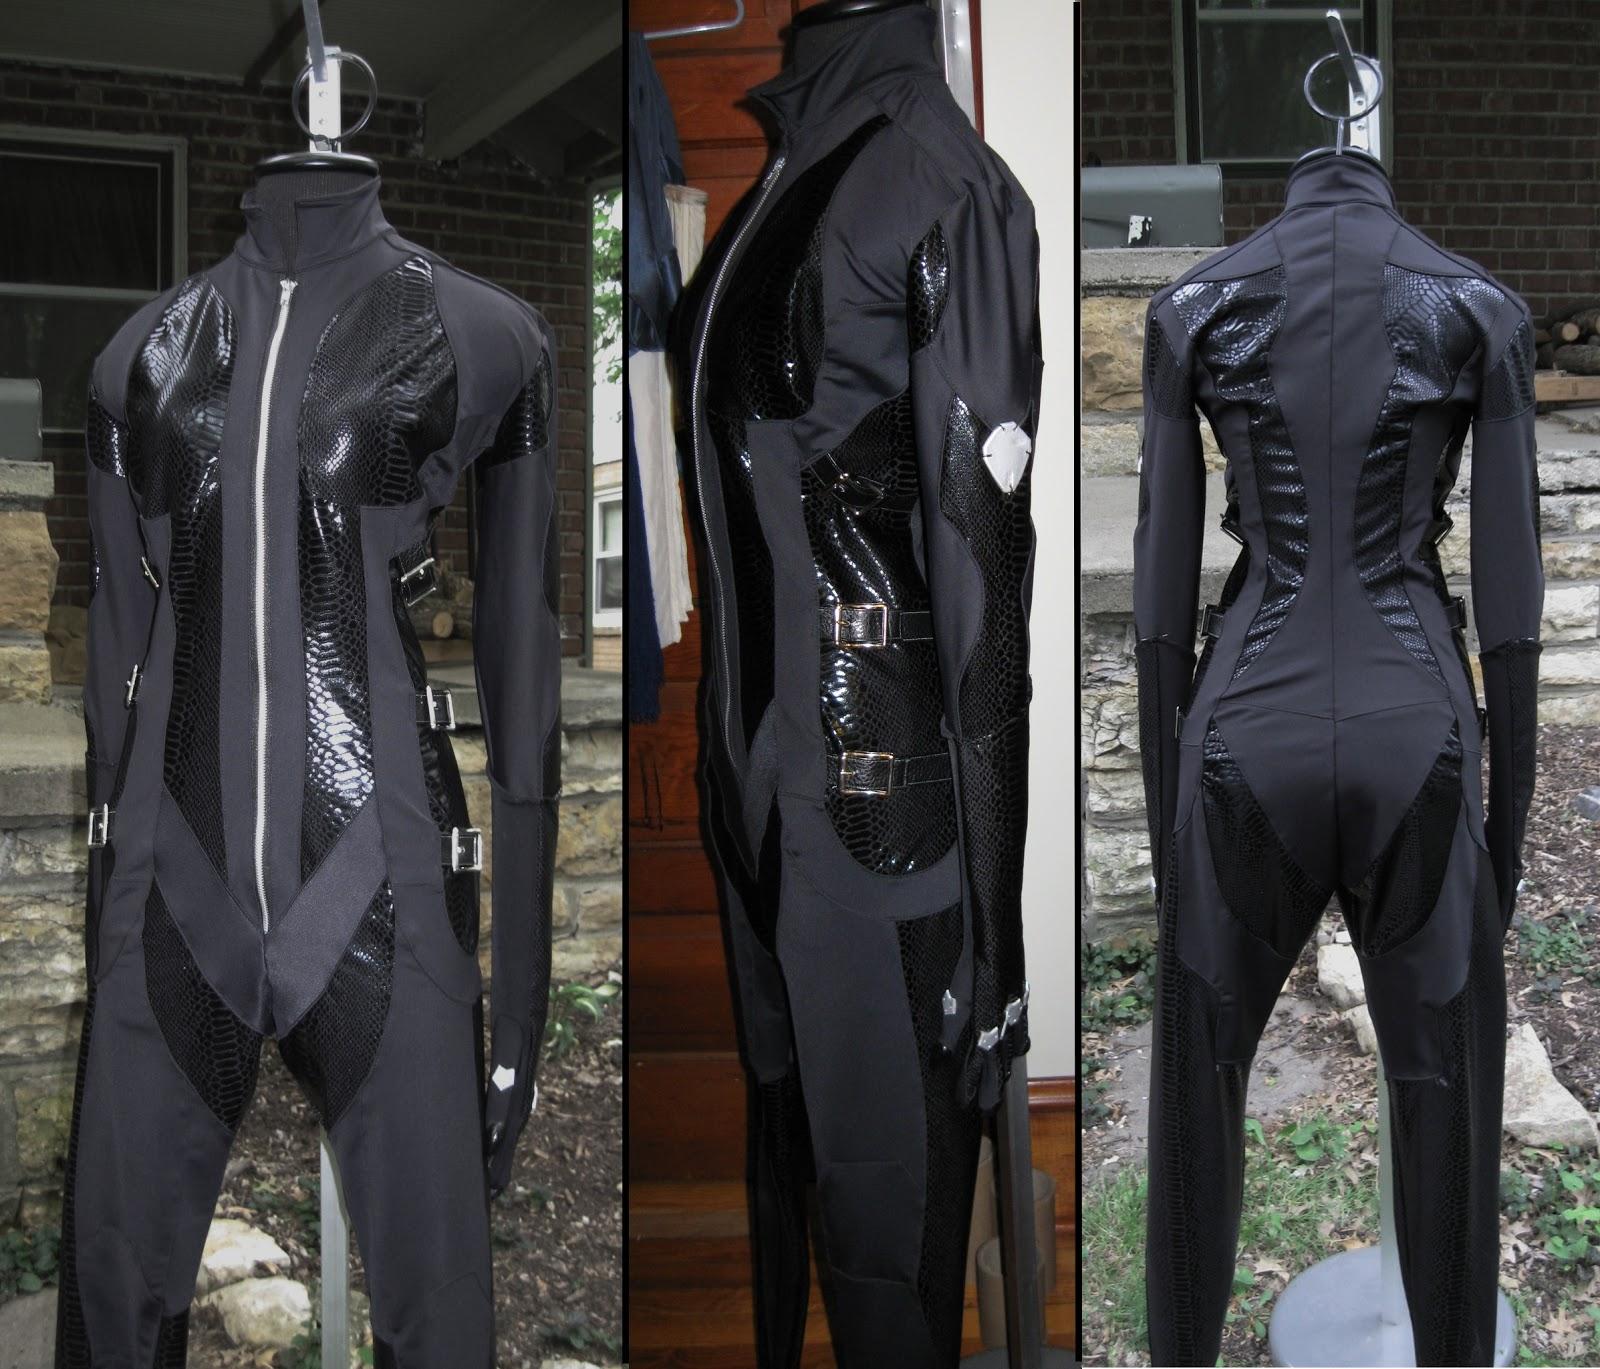 & The Literary Assassin: Arkham City Catwoman costume